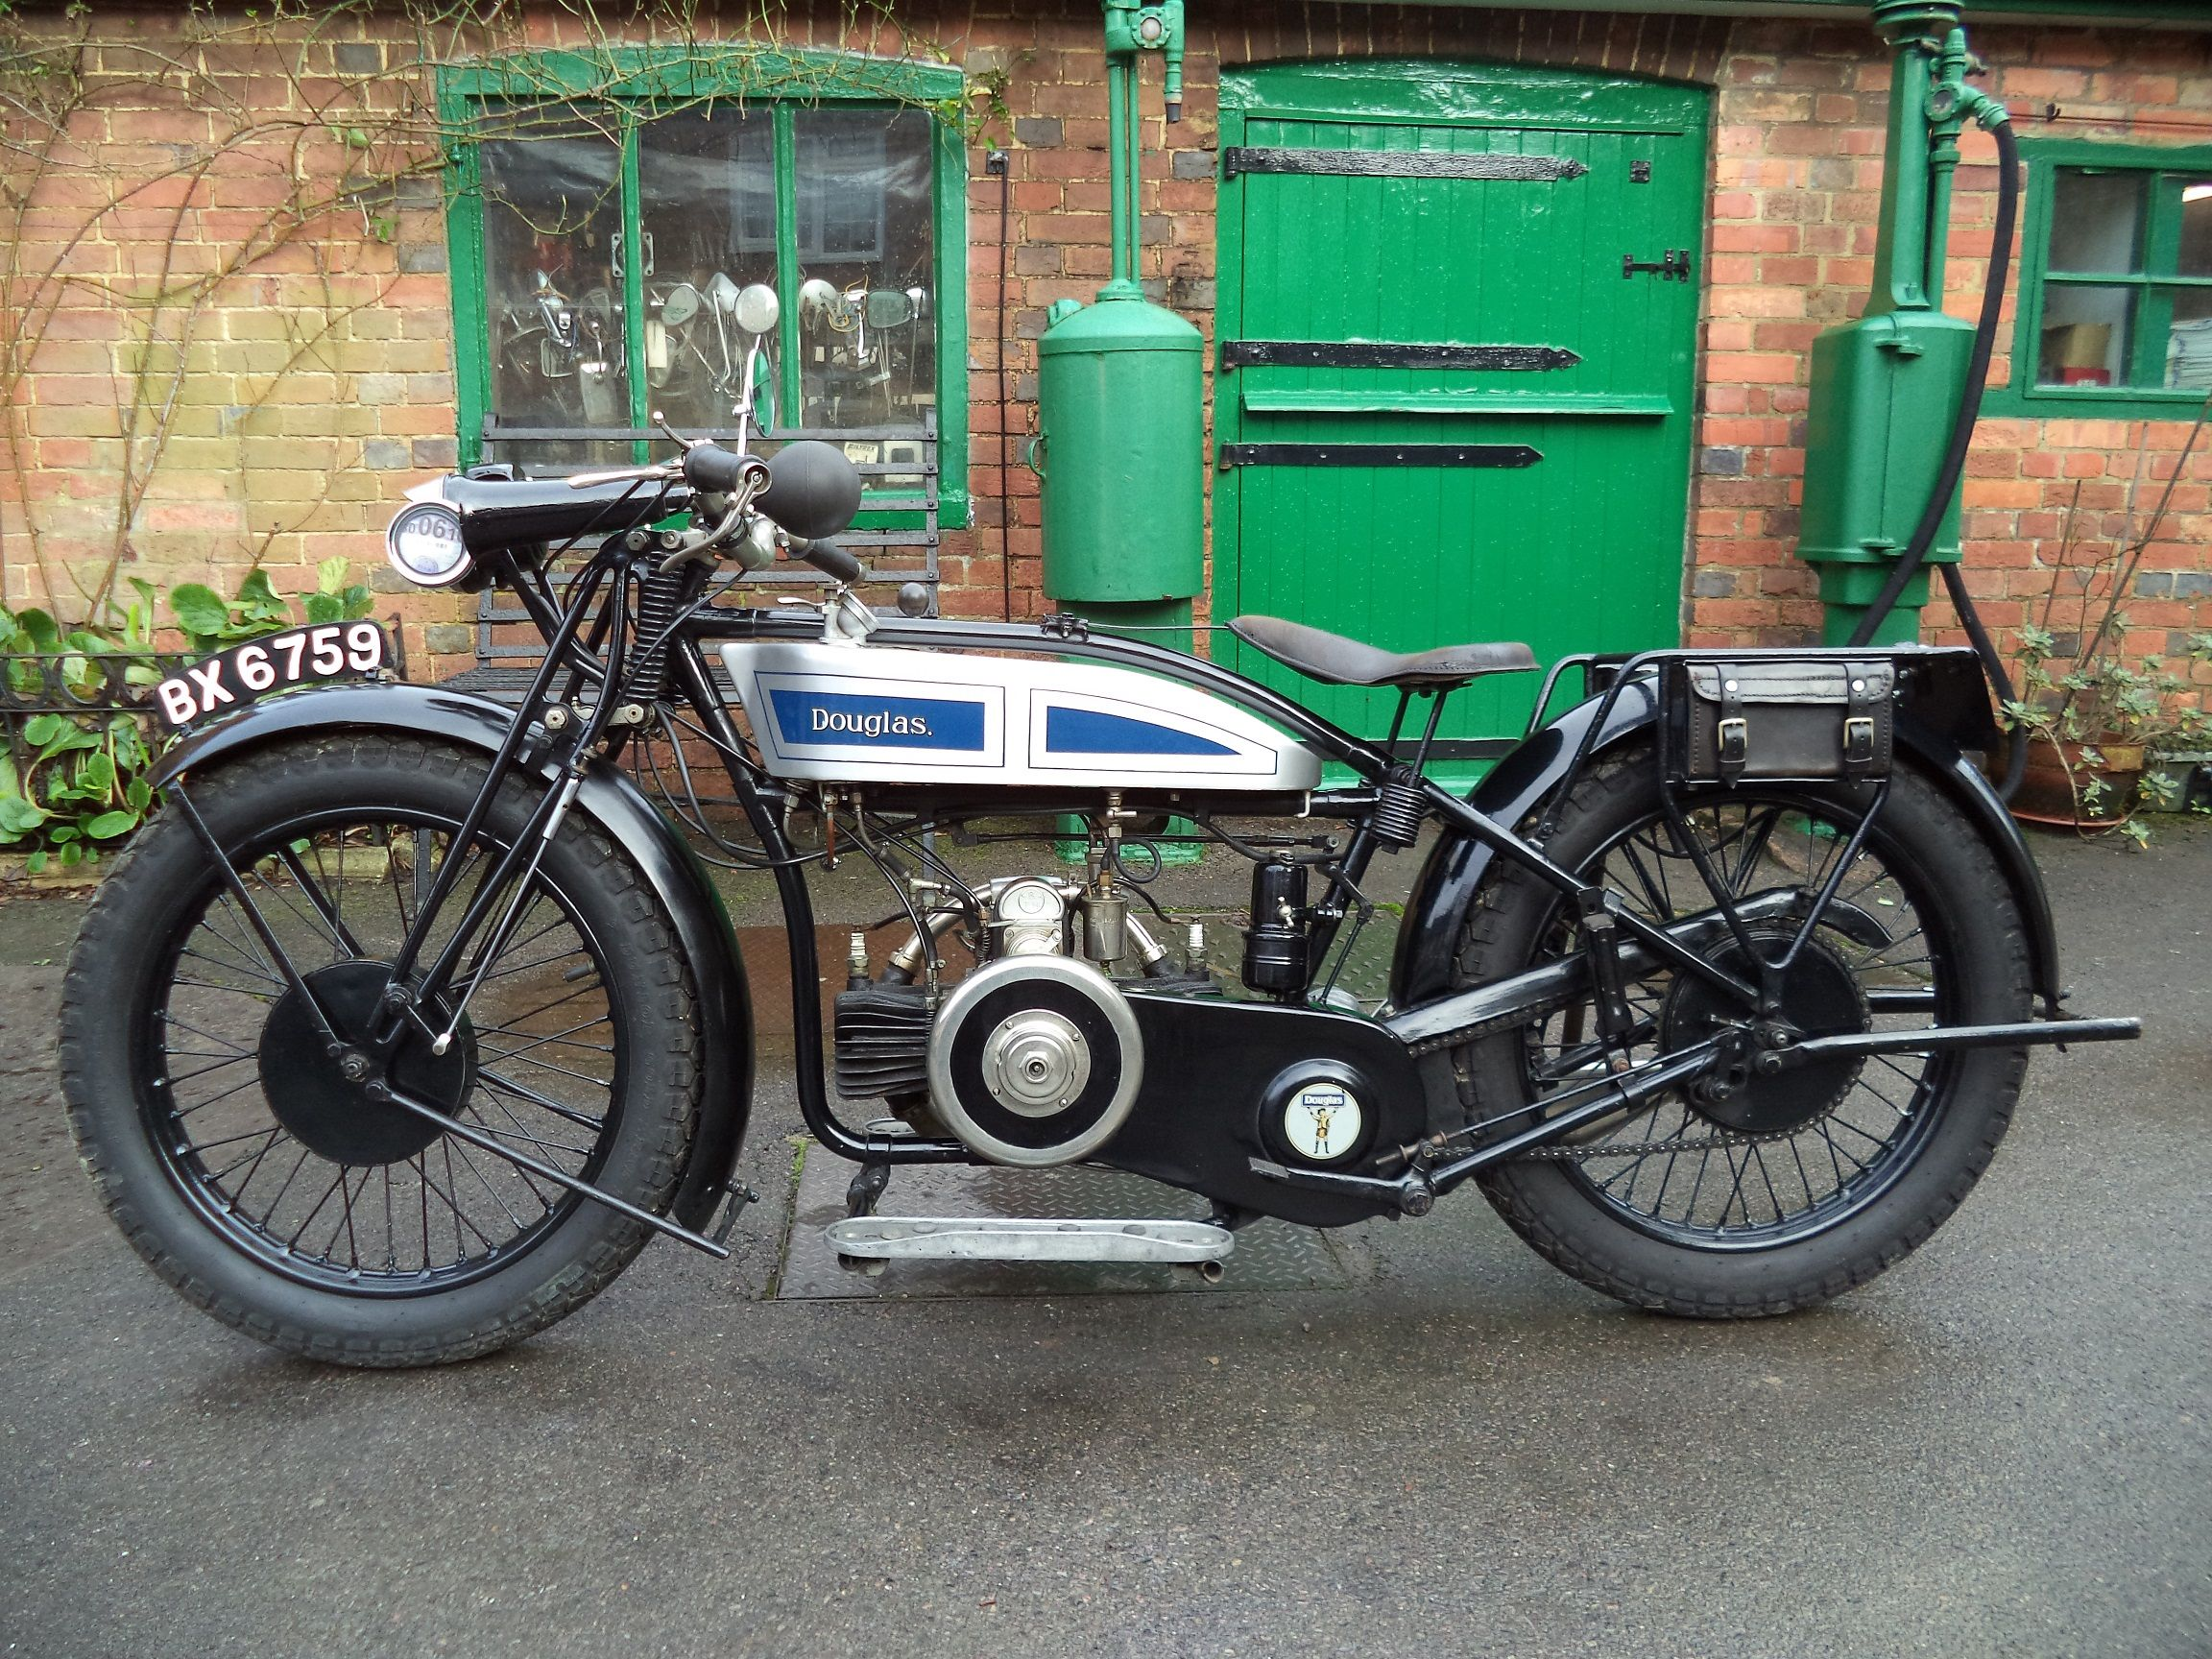 Verralls 1926 Douglas 350cc Ew Vintage Motorcycles Cool Bikes Vintage Motorcycle